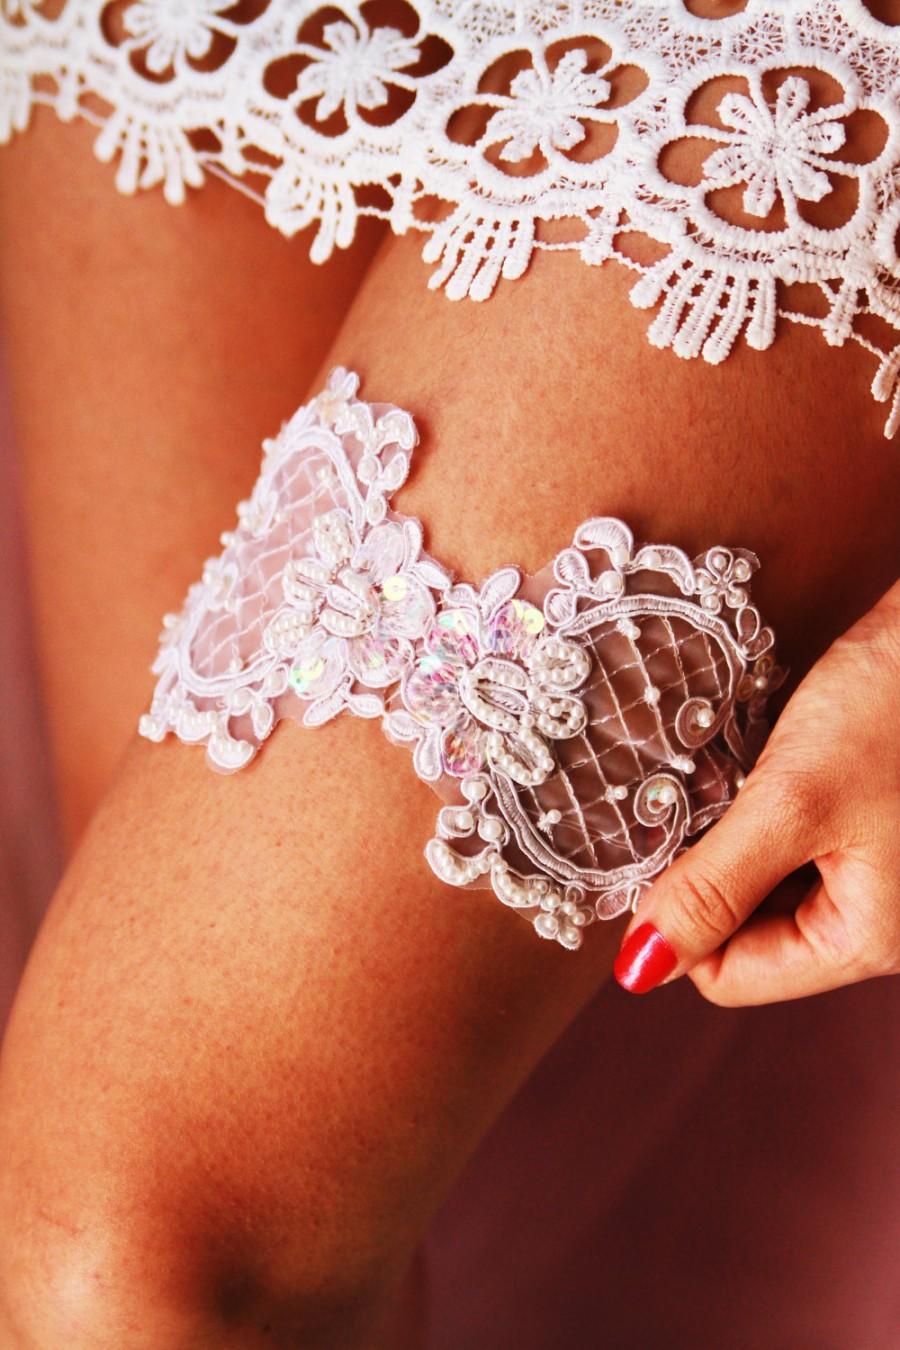 Свадьба - Bridal Garter Wedding Garter Bridal Lace Garter- Beaded Keepsake Garter - Ivory Rustic Bohemian Wedding Bridal Garter Belt